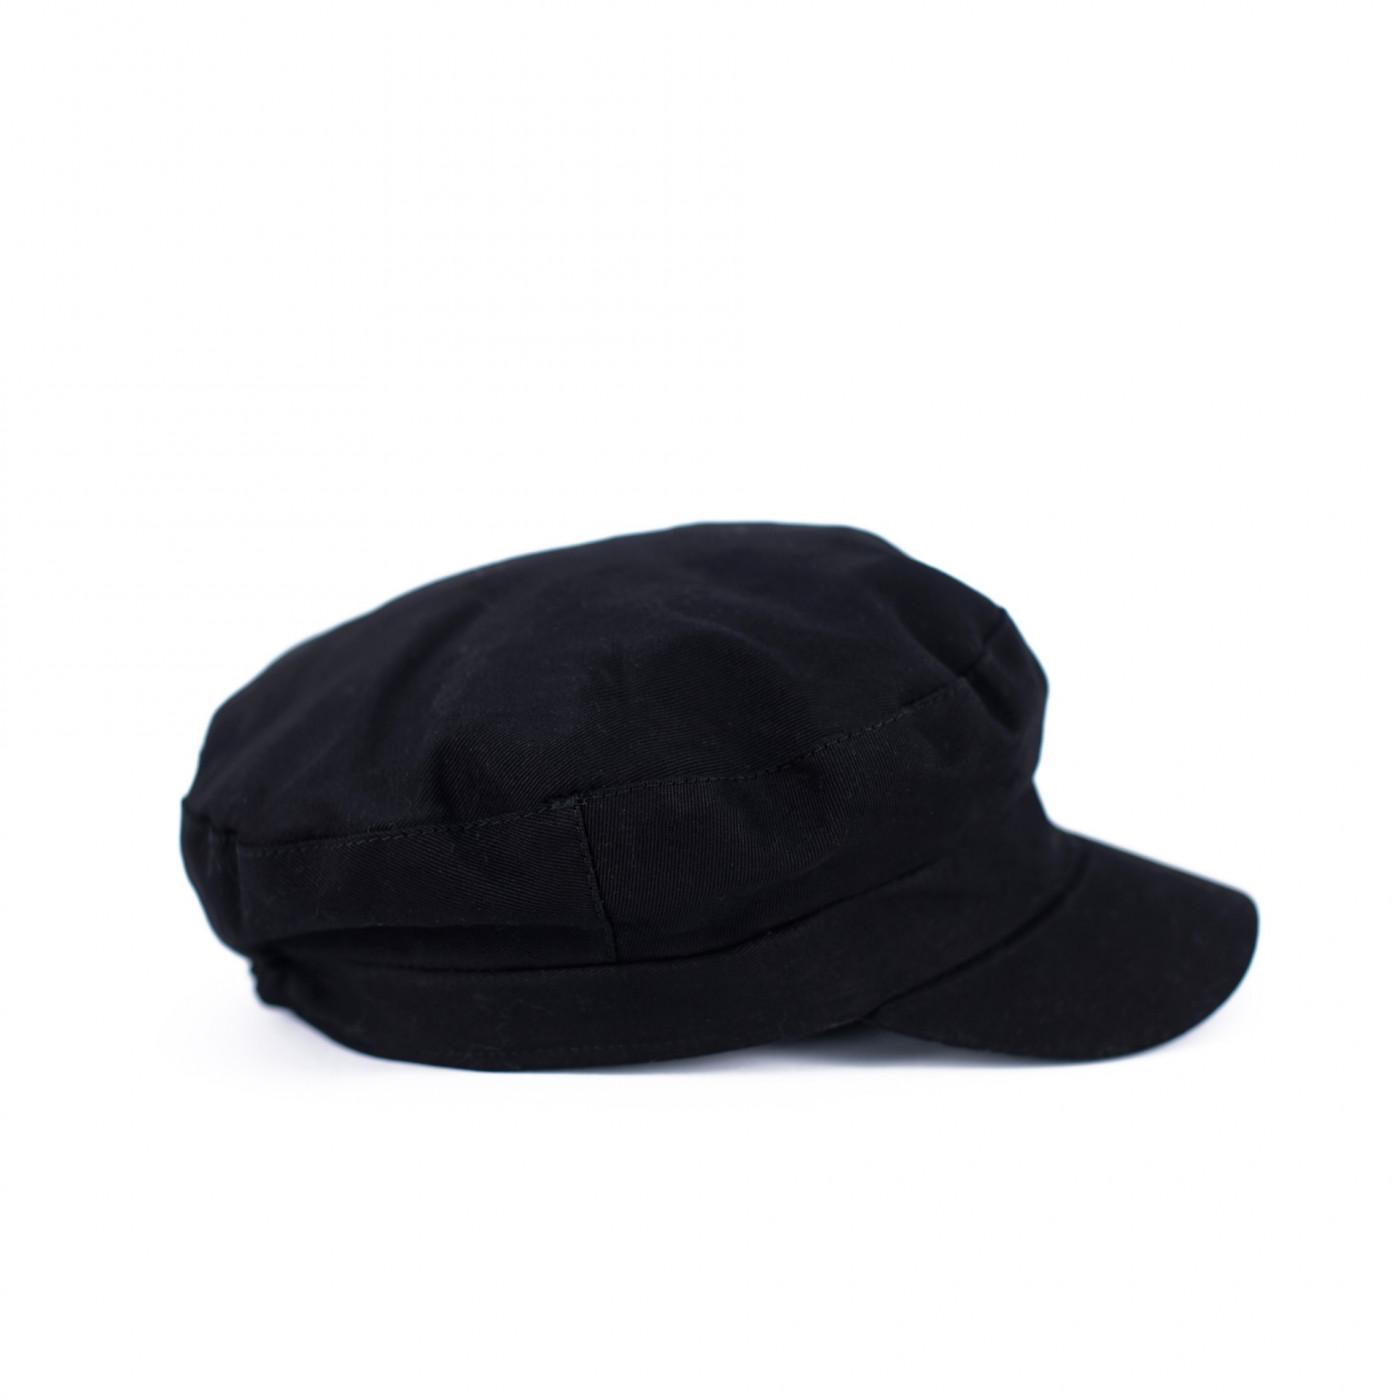 Art Of Polo Unisex's Hat cz19328